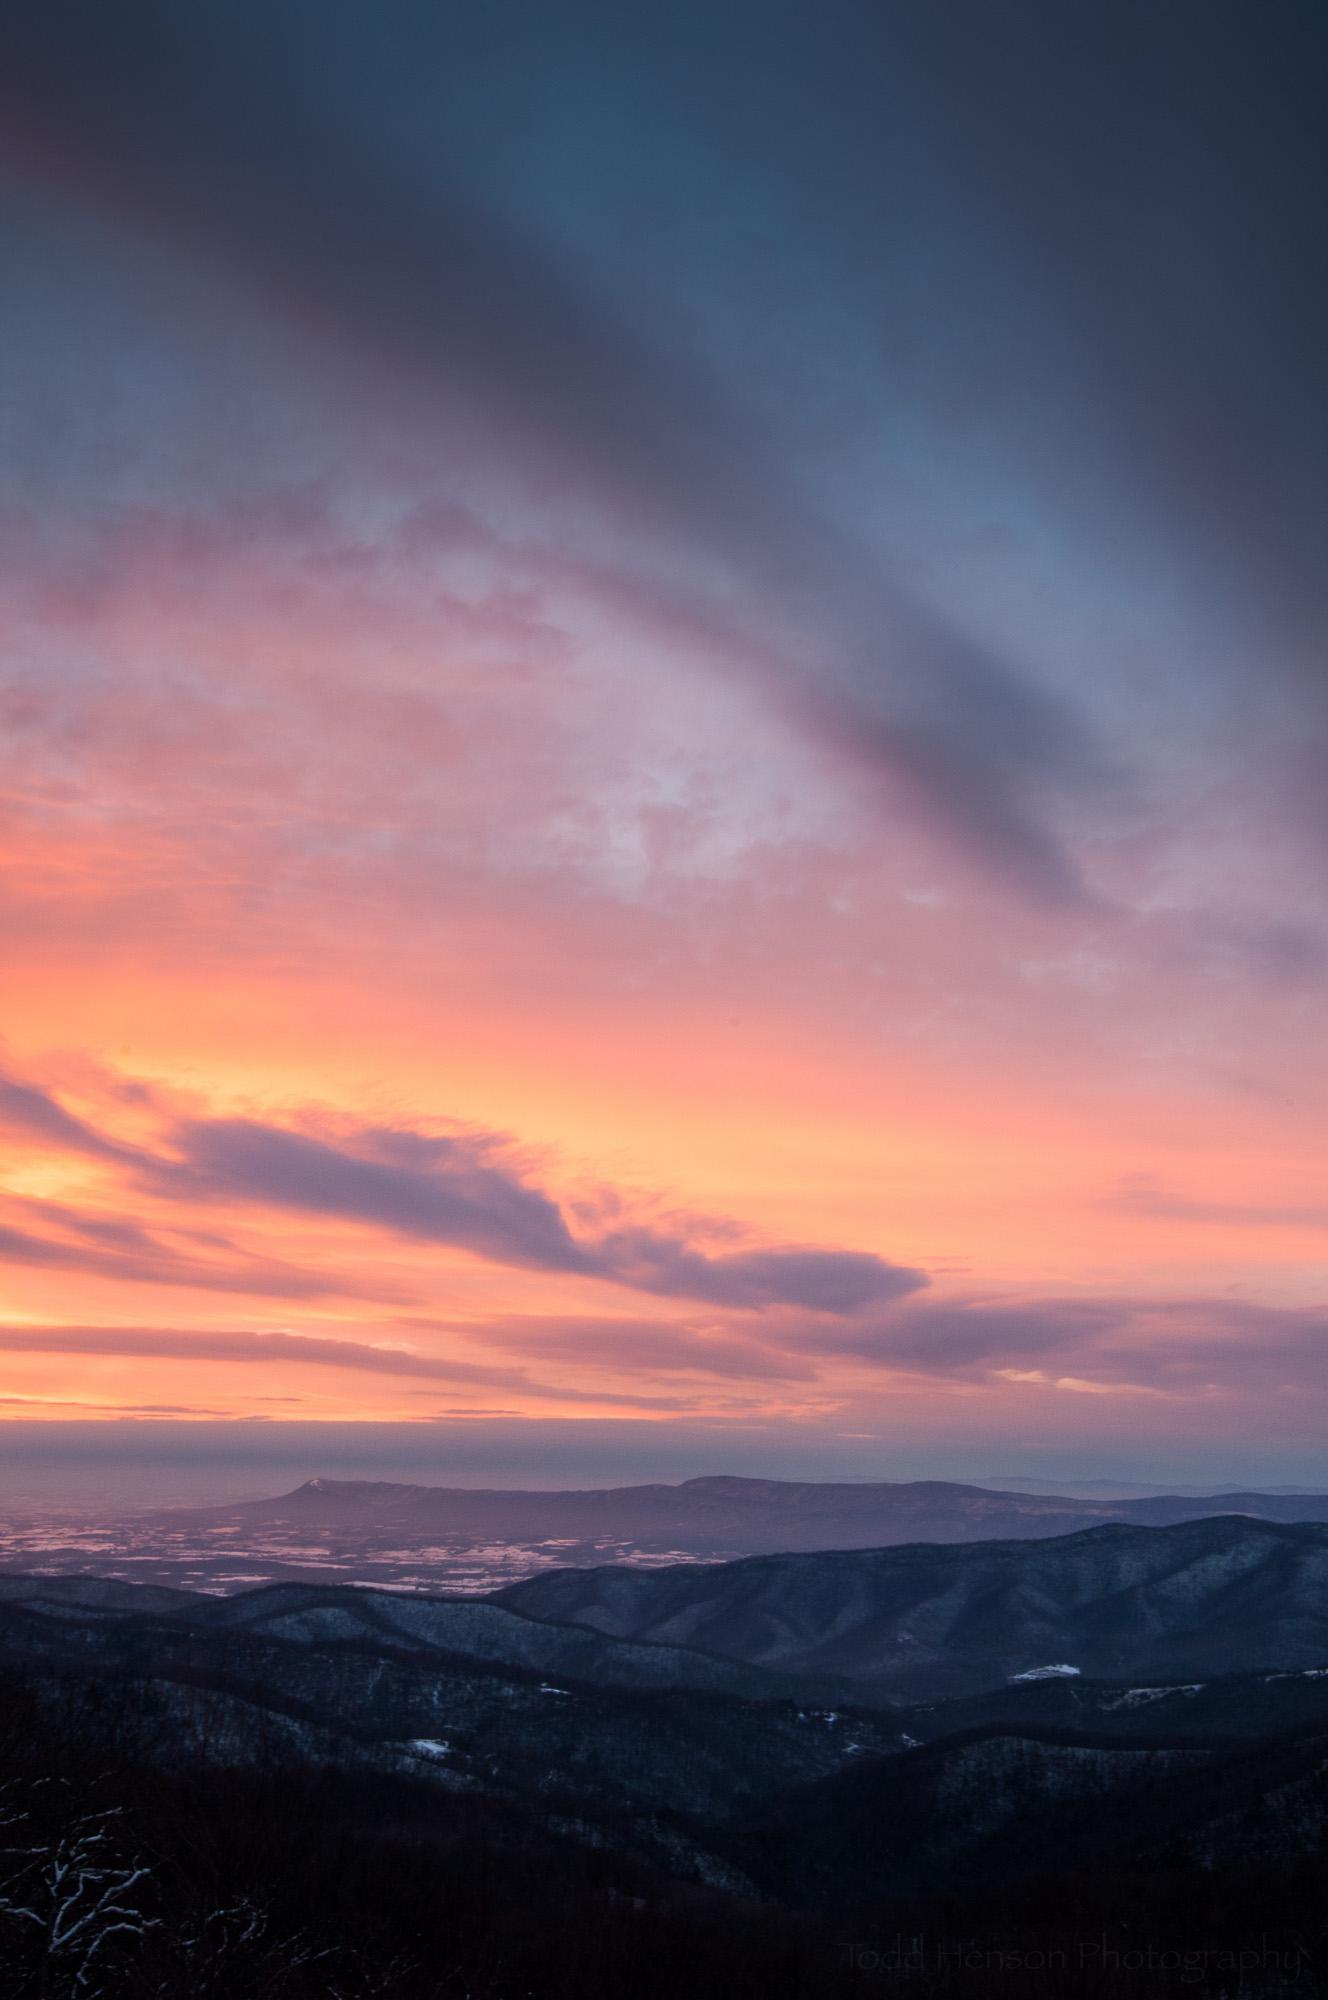 skyline-drive-sunset-3_THP.jpg